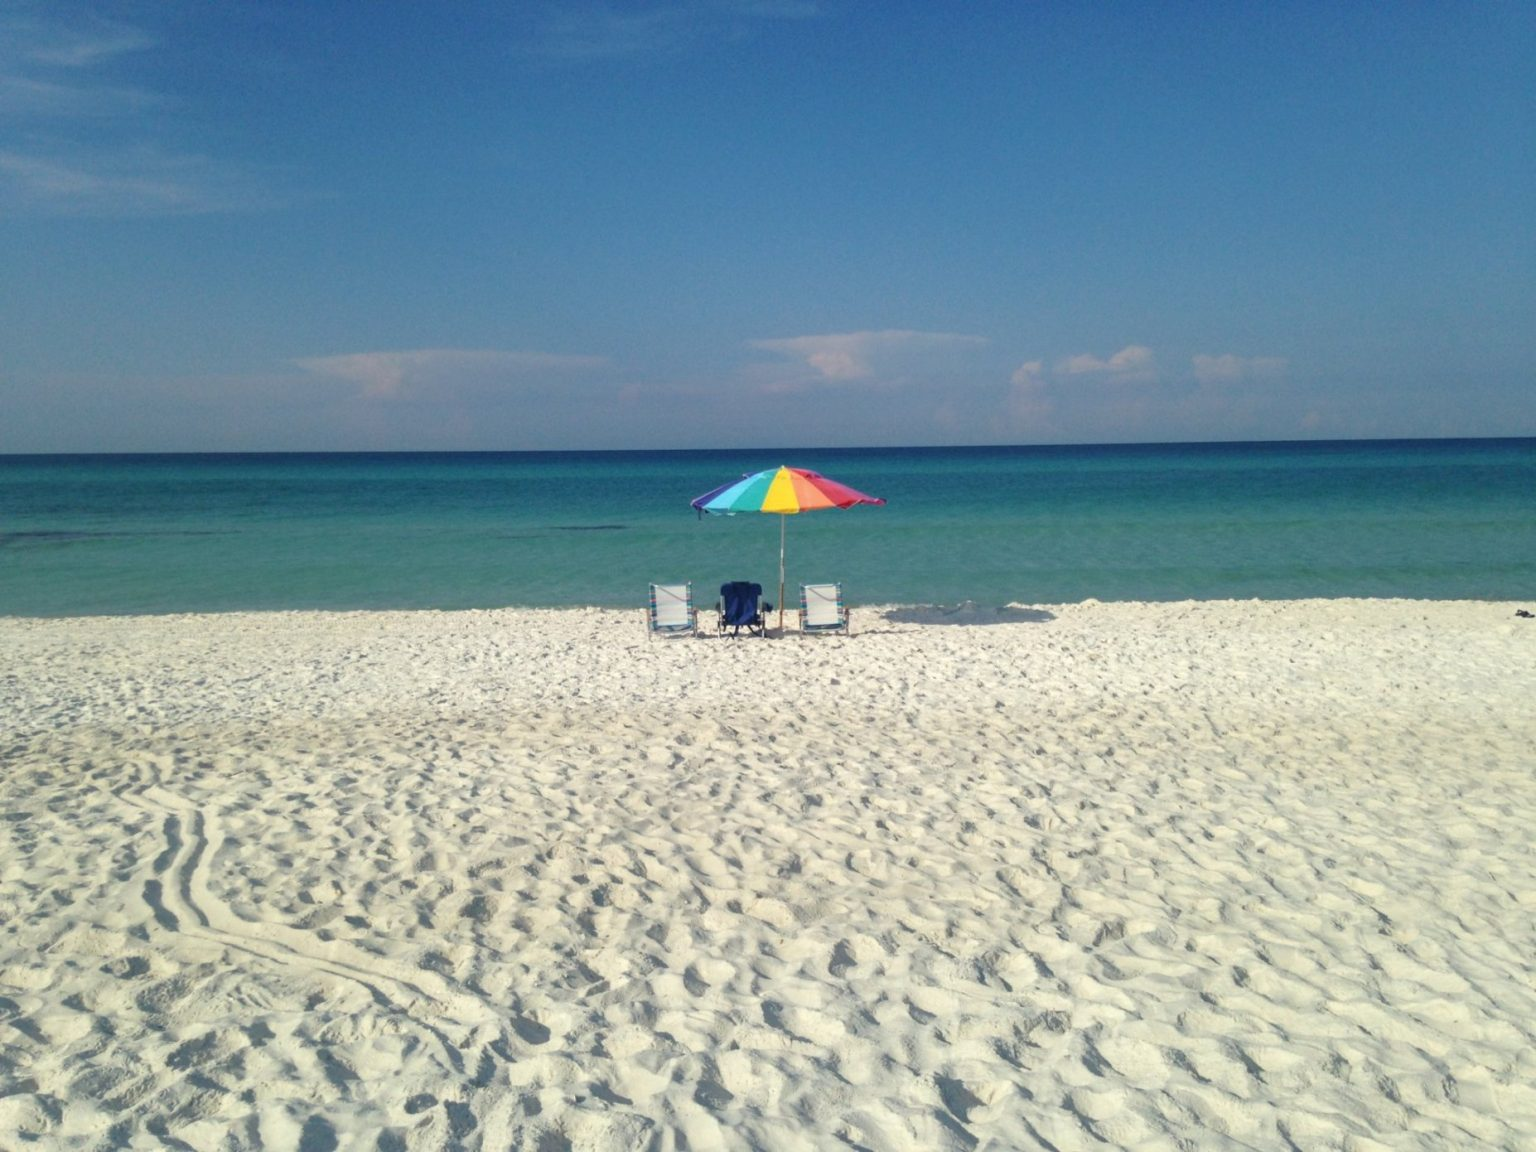 Beach in Sunnyside Florida